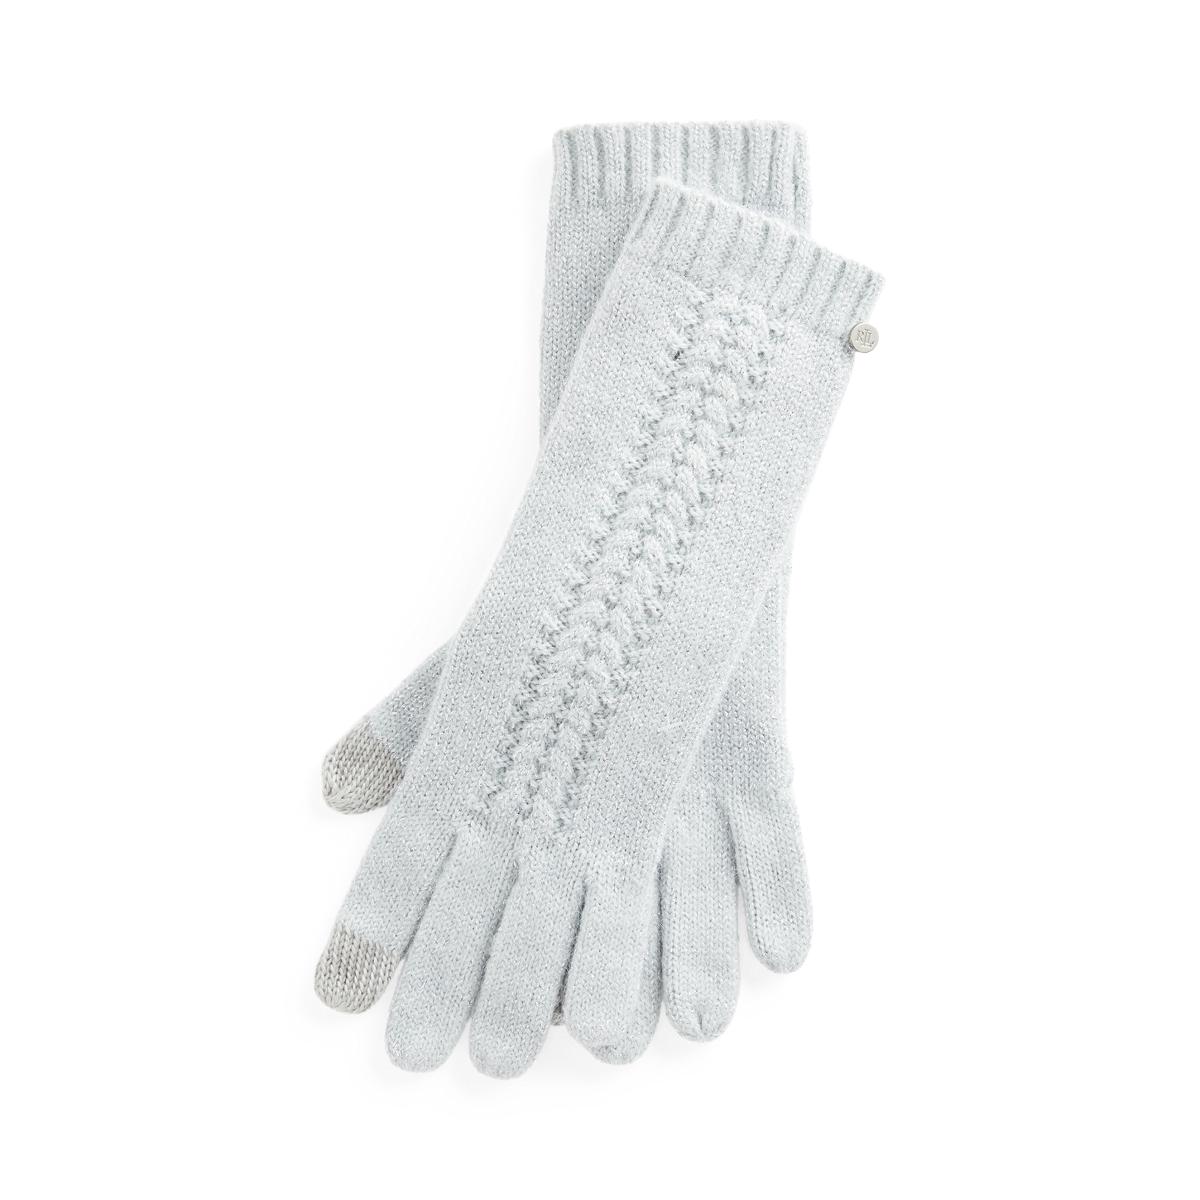 Textured Metallic Tech Gloves